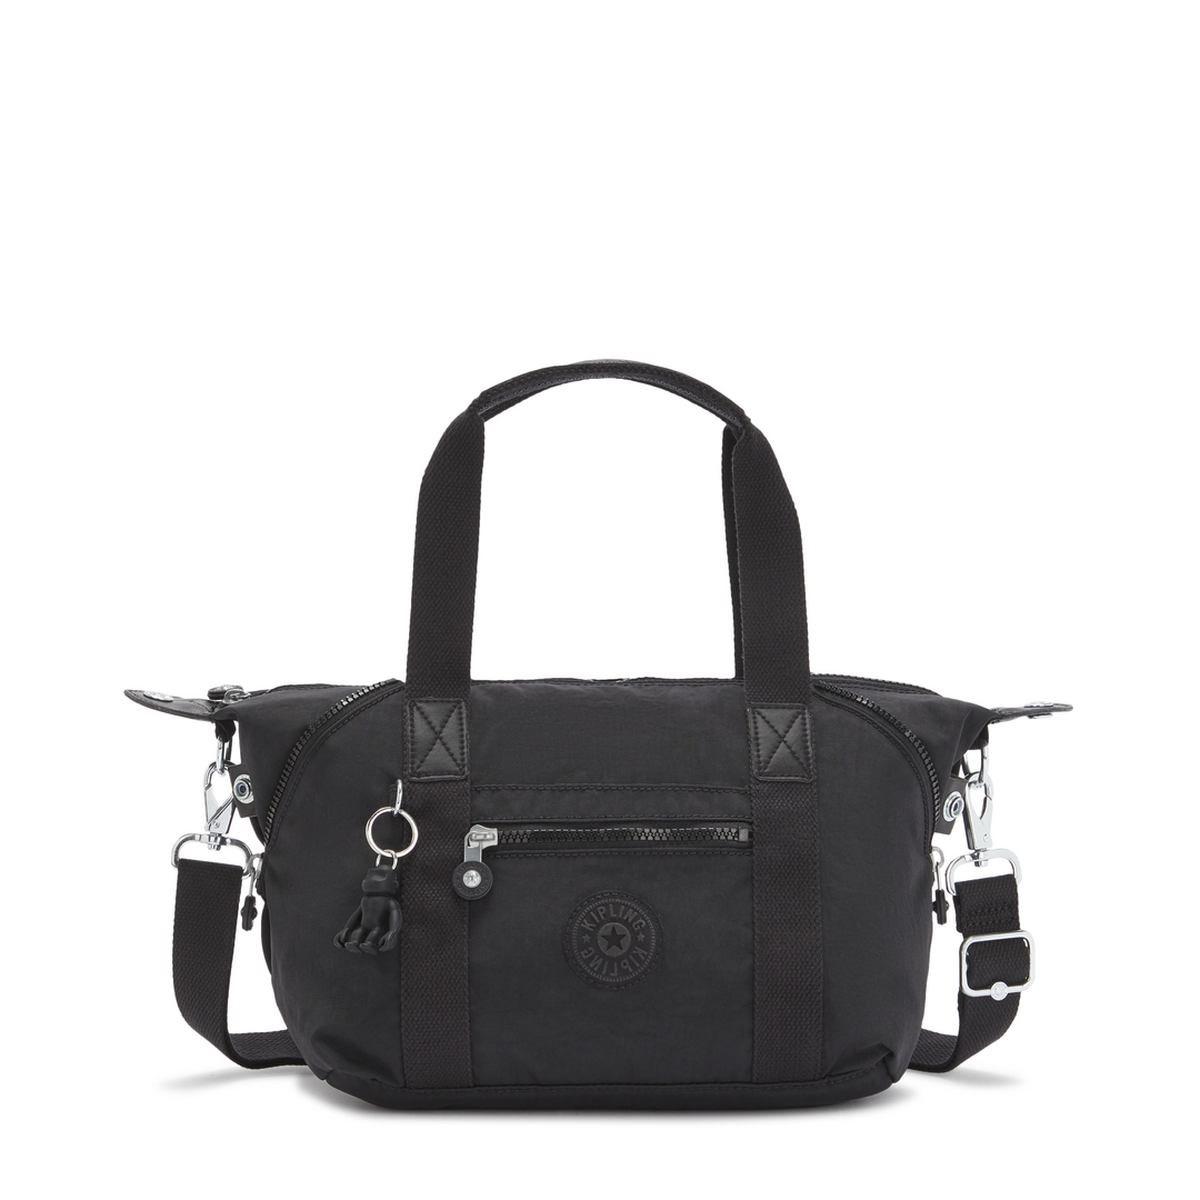 Kipling Τσάντα ώμου 34x21x18.5cm Art Mini Black